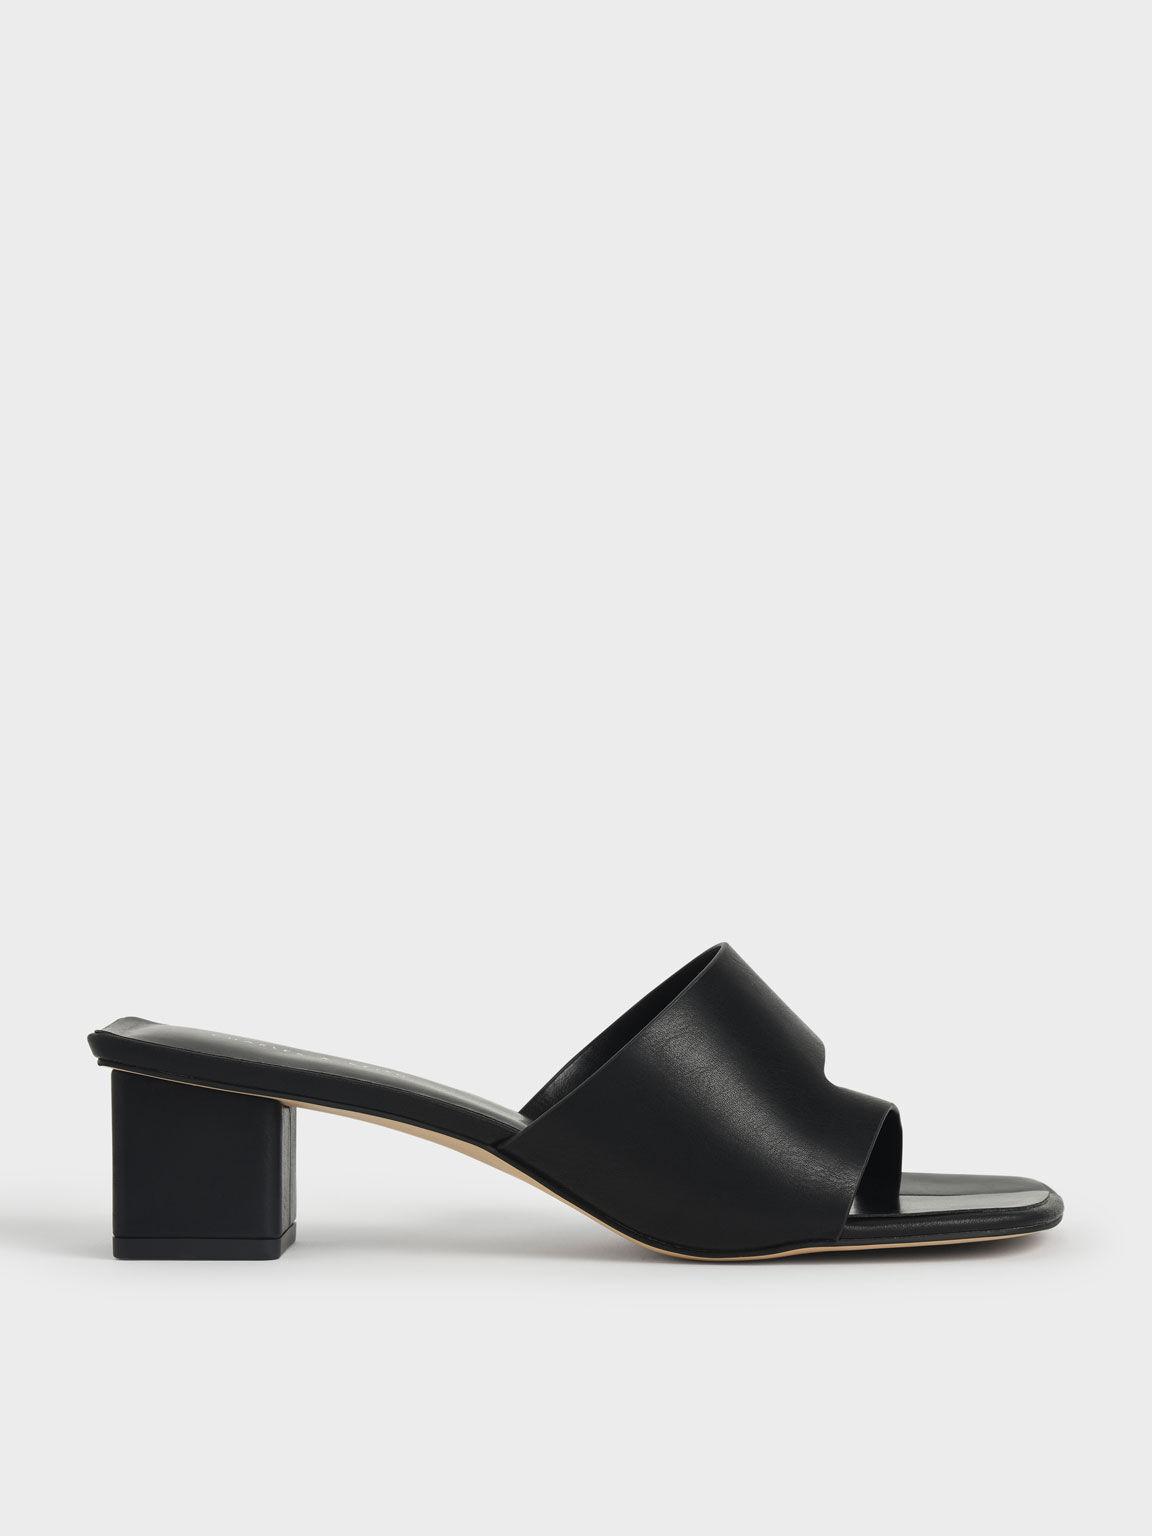 Cut-Out Thong Sandals, Black, hi-res